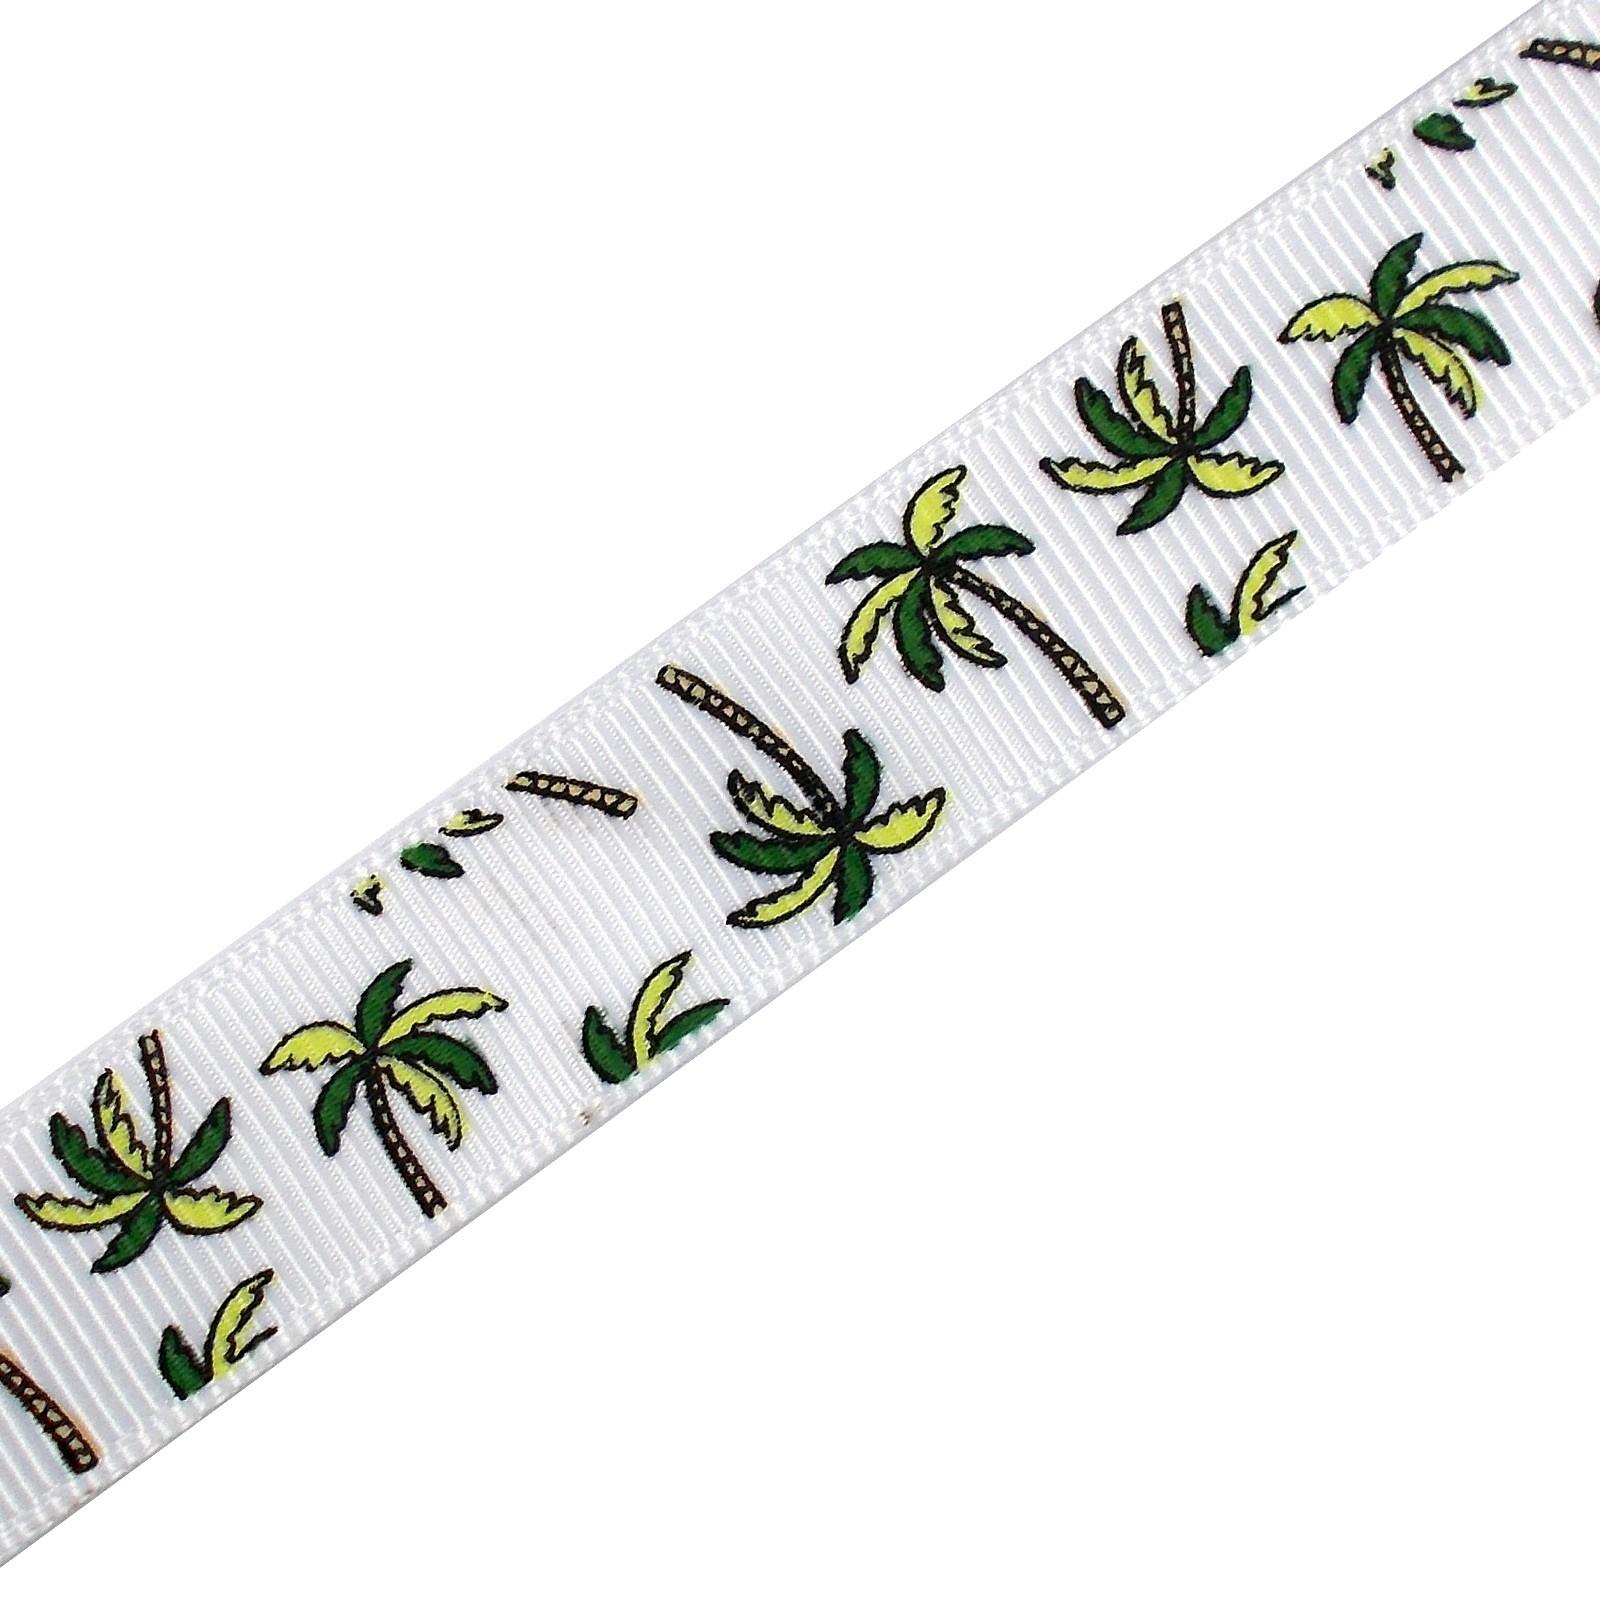 Tropical Print Grosgrain Ribbon 16mm Wide Palm Trees 1 metre length